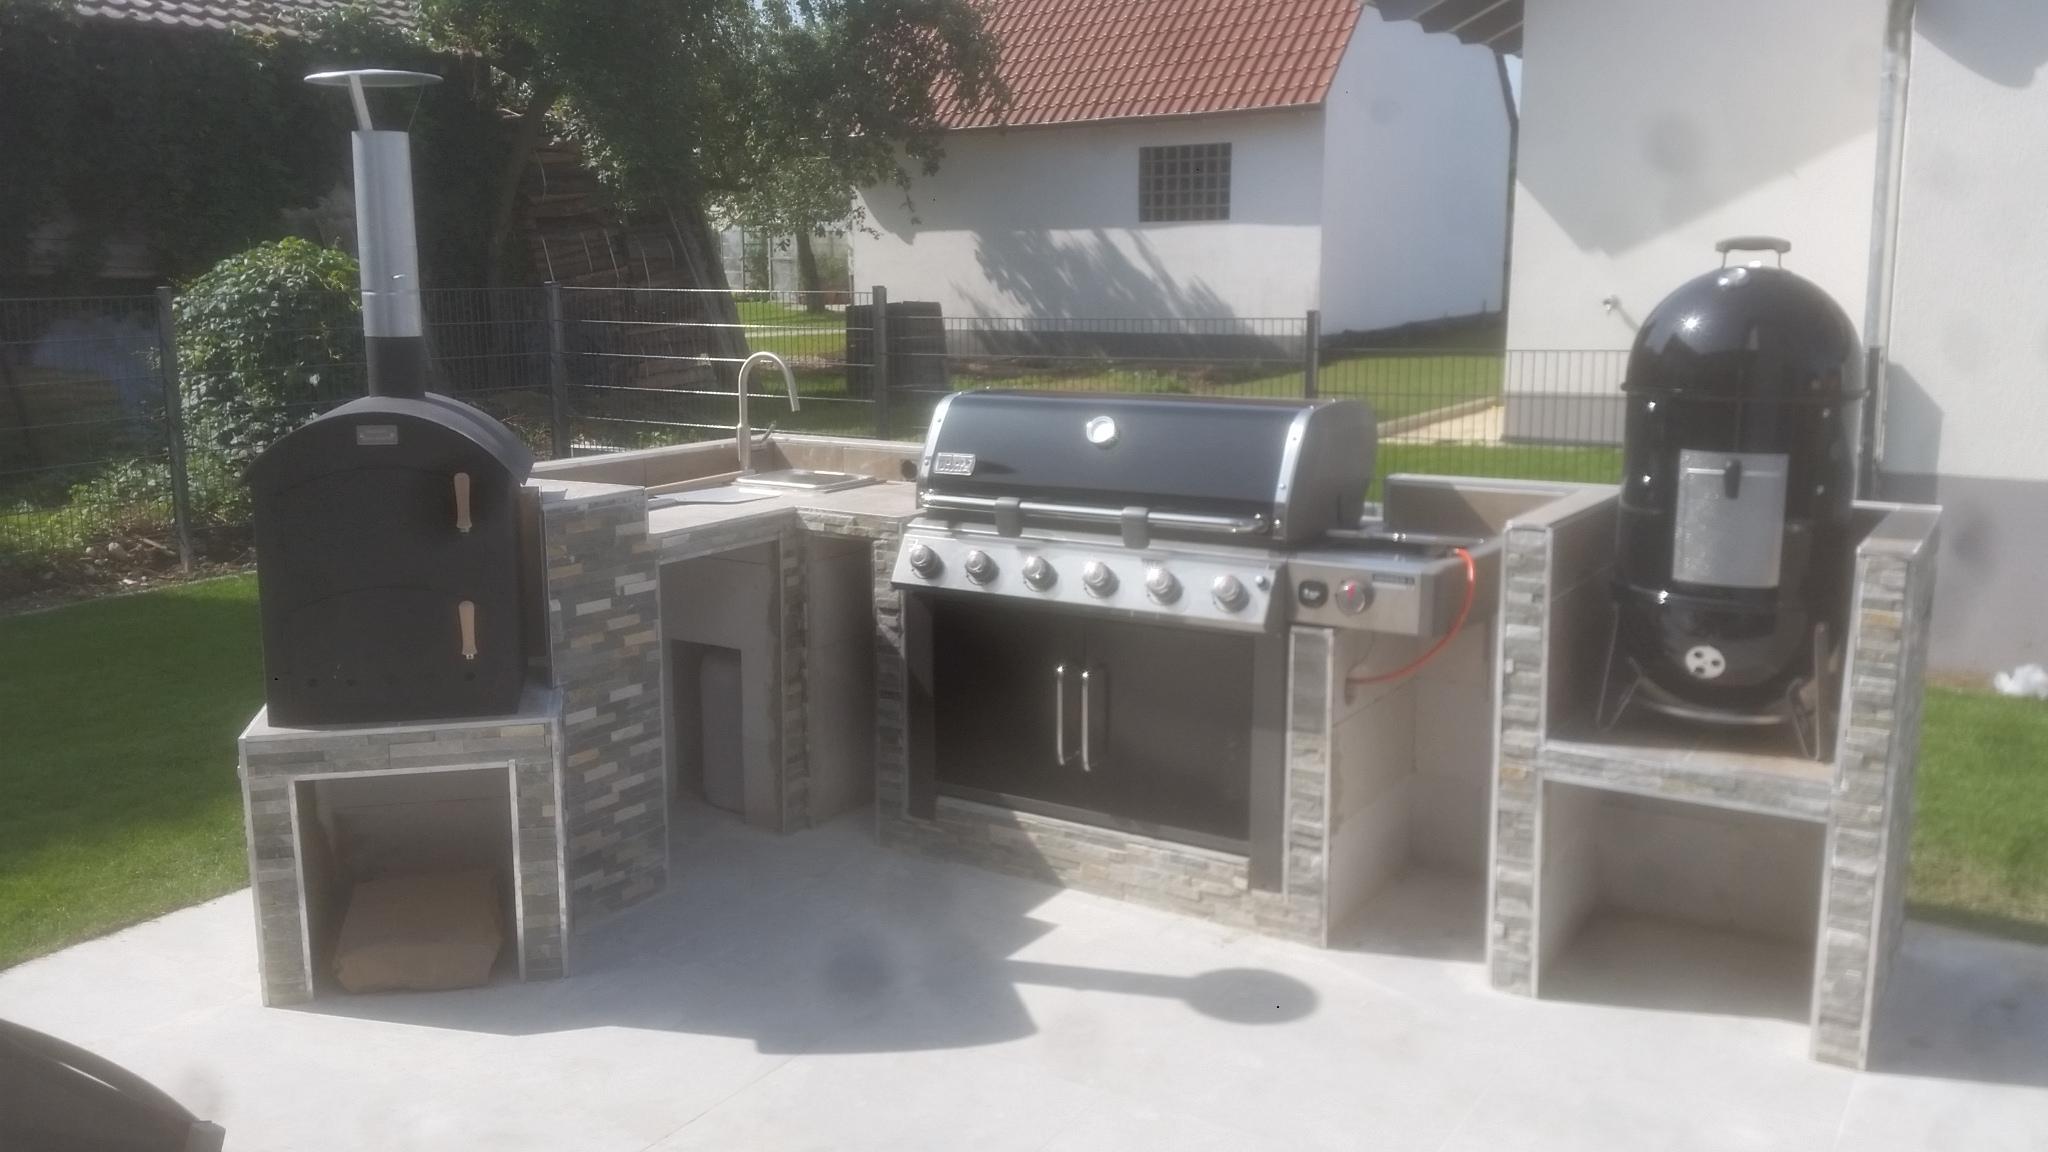 Weber Outdoor Küche Preise : Diy outdoor küche diy do it yourself ideen anleitungen